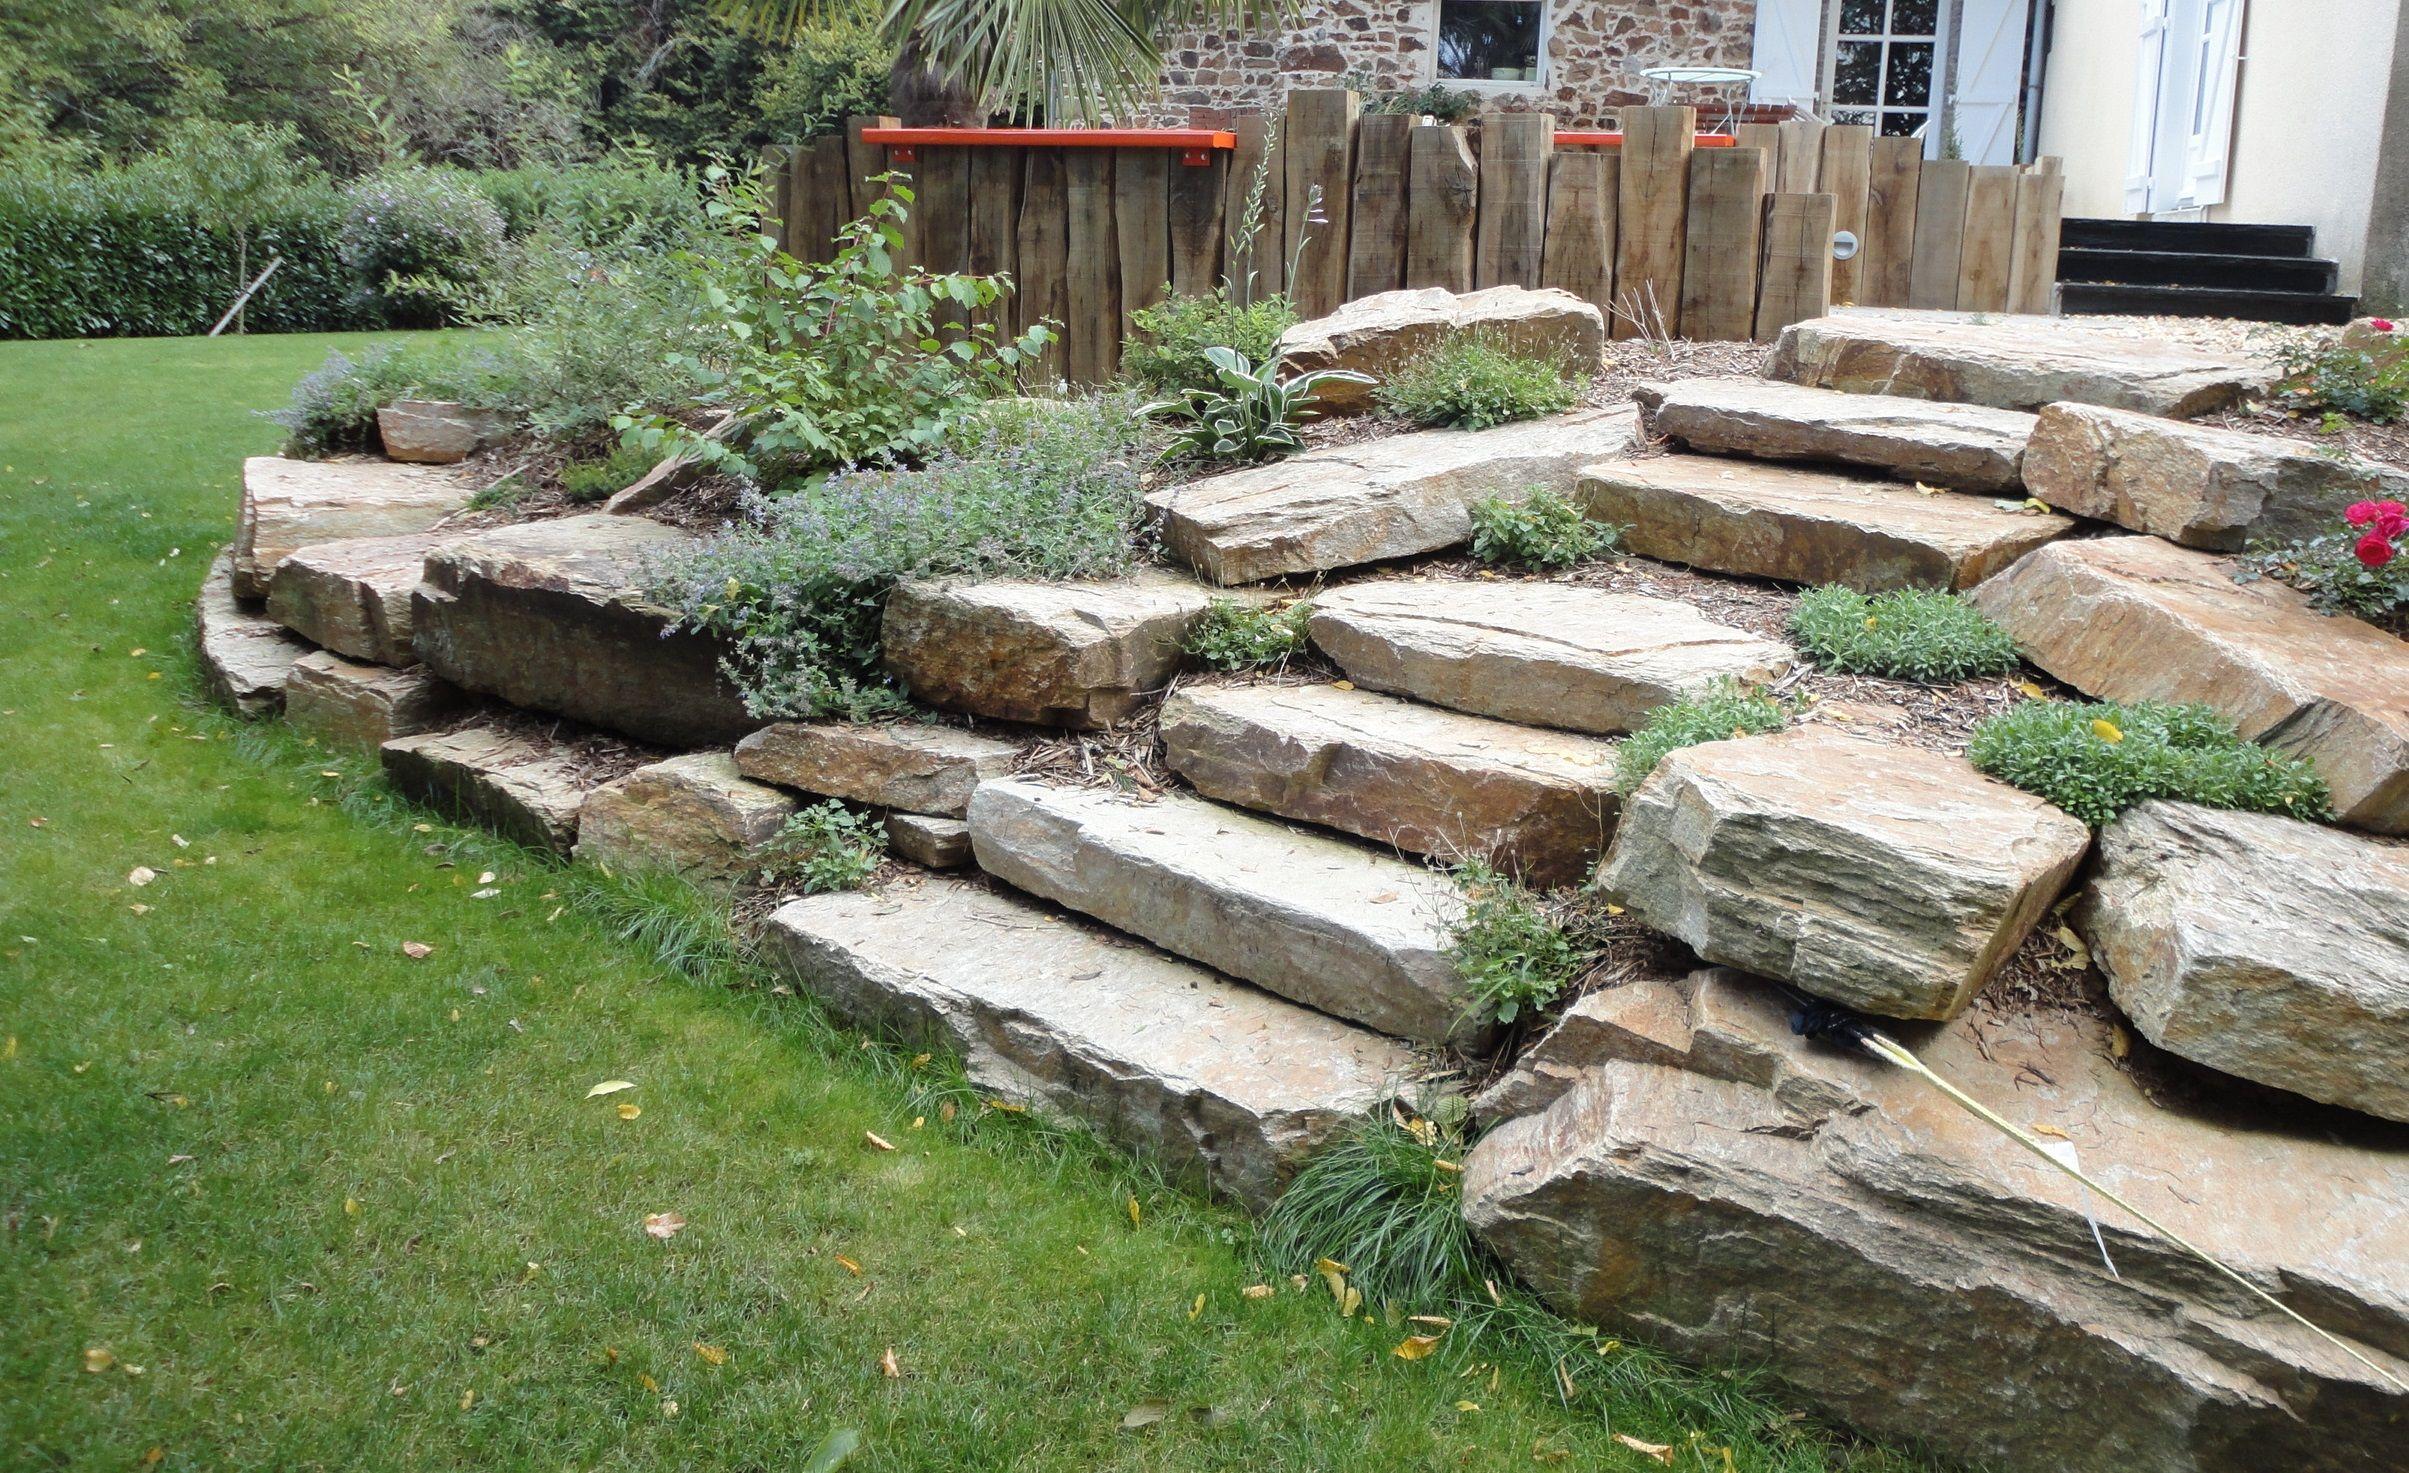 Rebeyrol Createur De Jardins Amenagement De Jardin Limoges